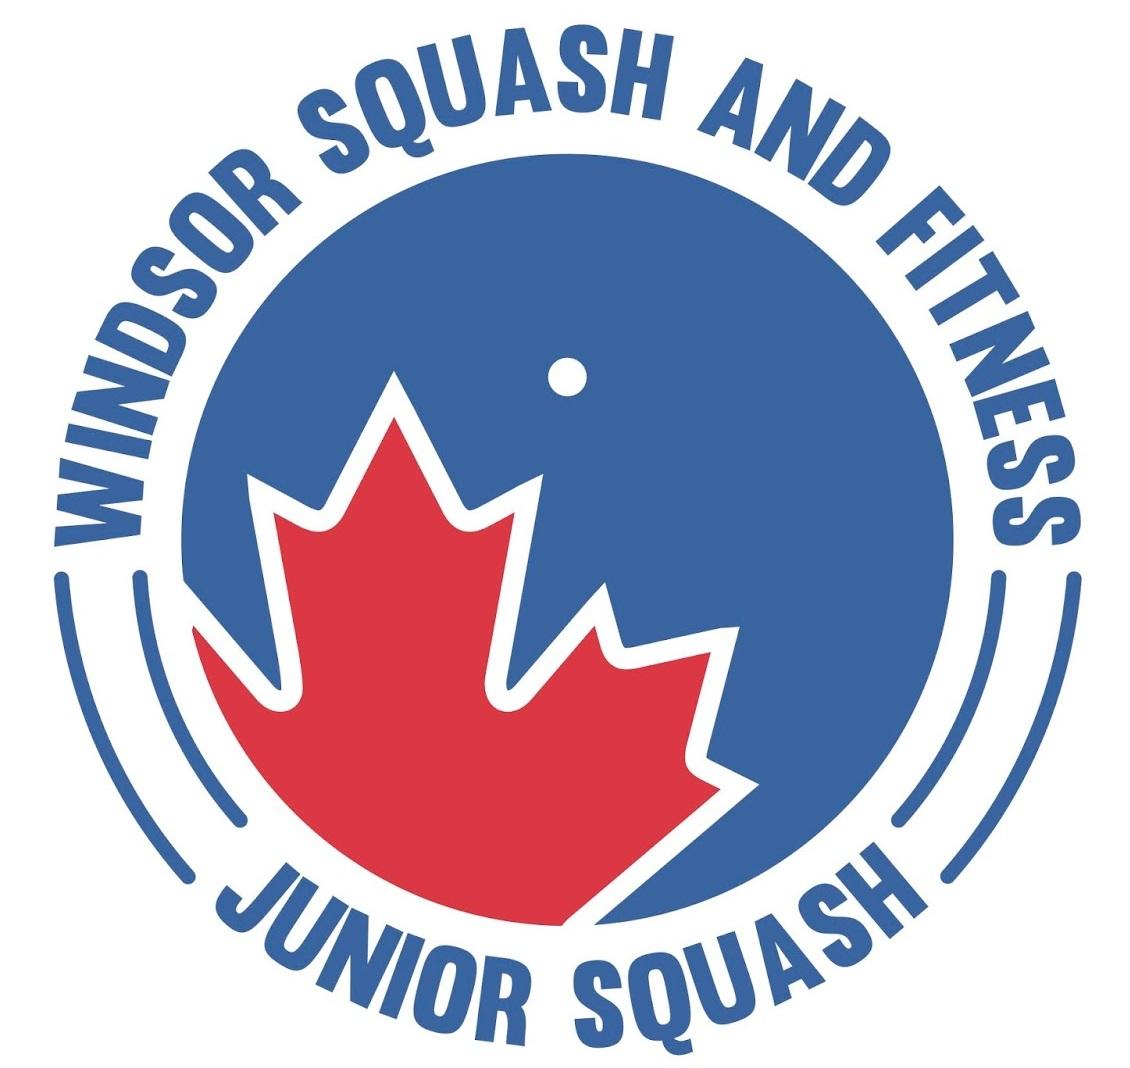 windsor_squash_fitness_red.jpg